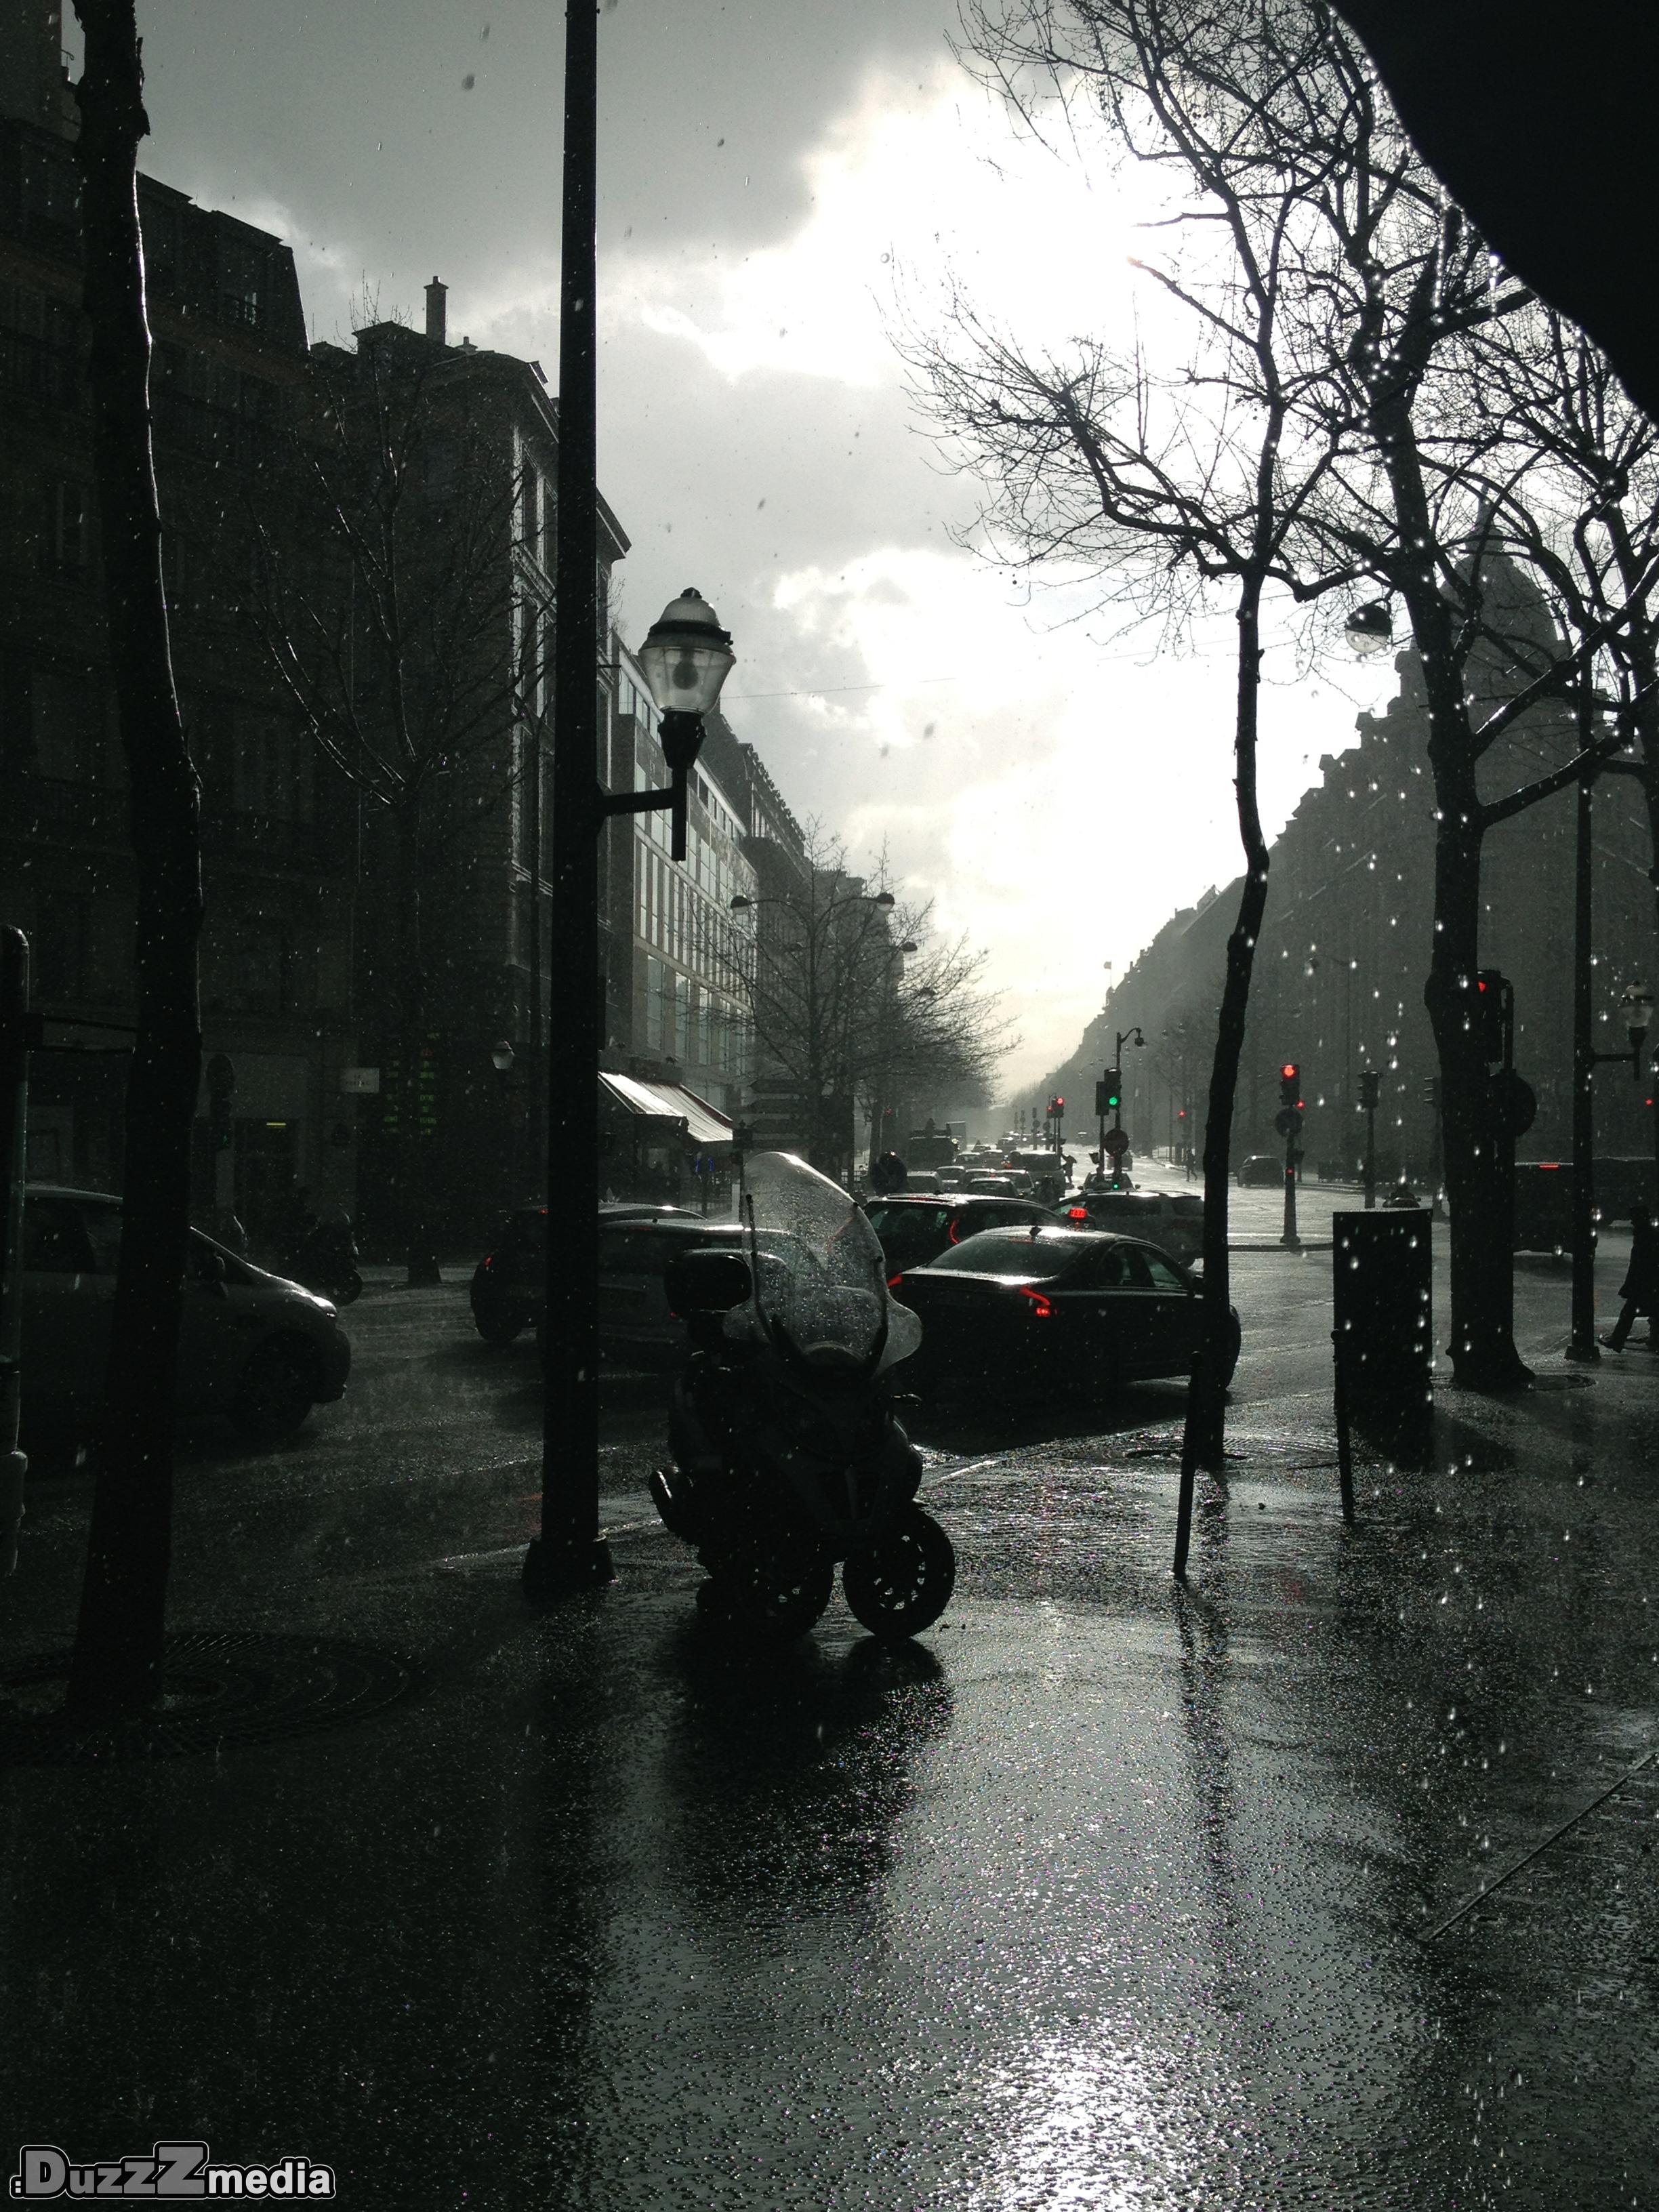 Photo Paris in the dark by david couturier